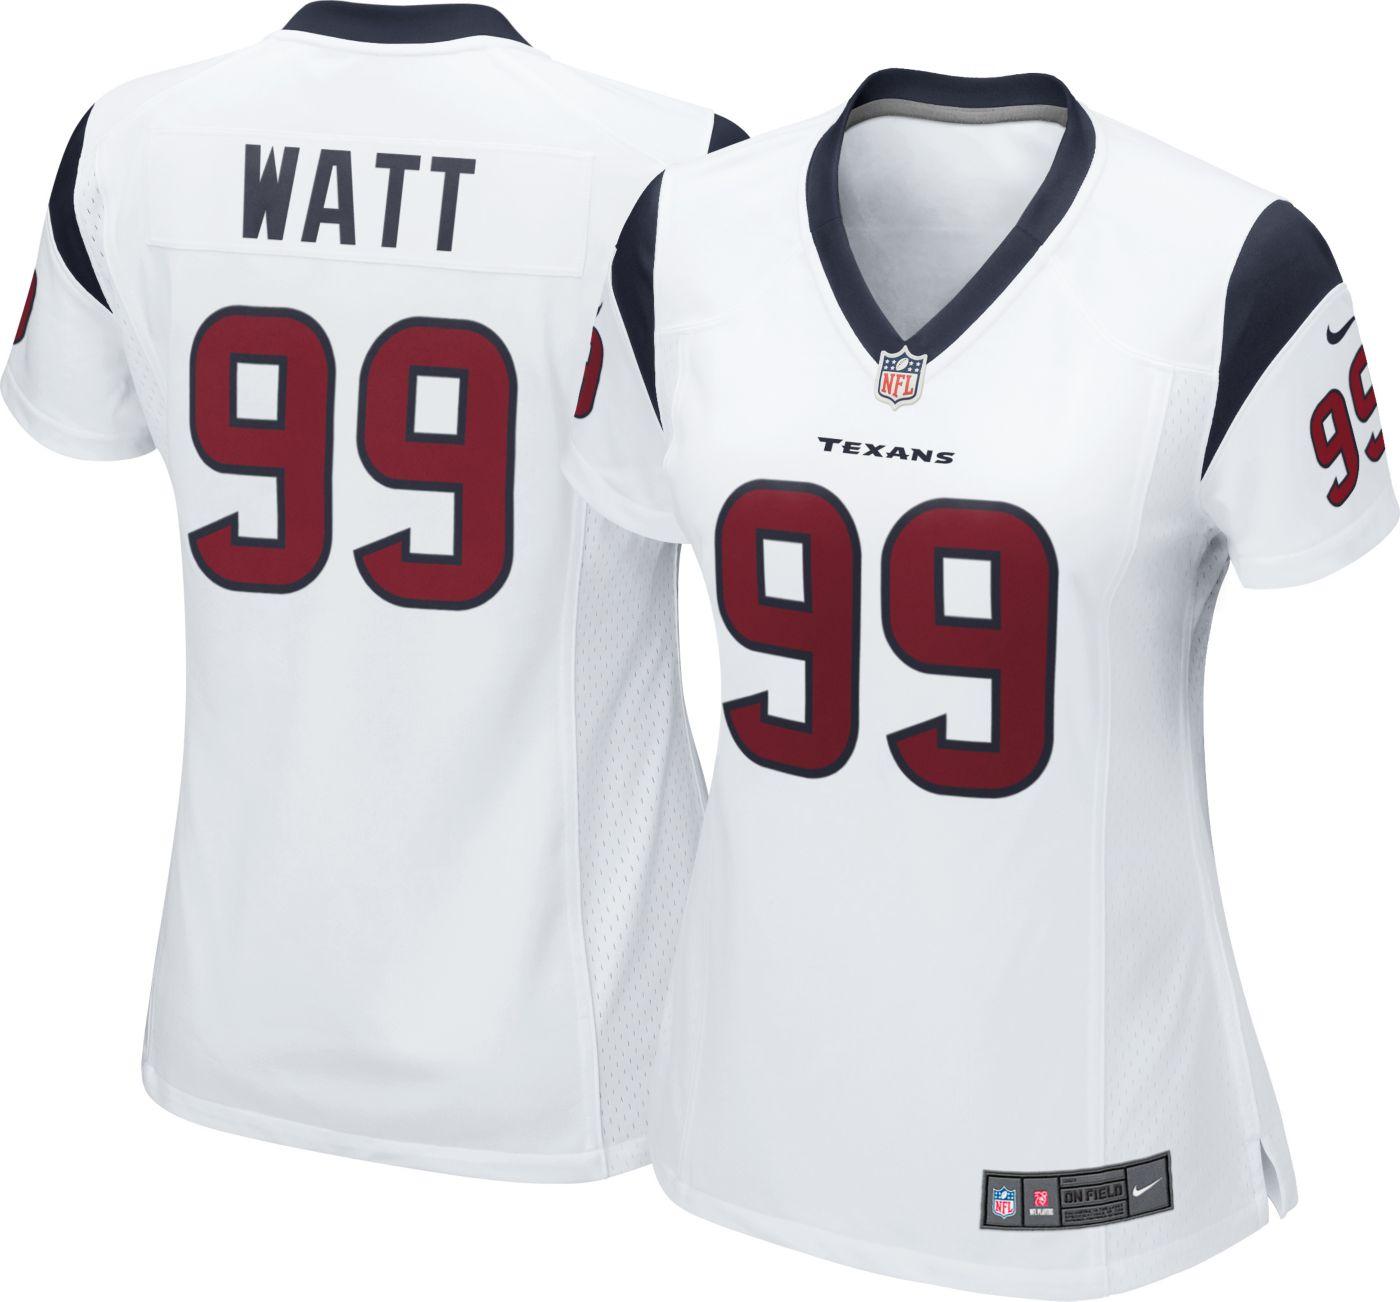 Nike Women's Away Game Jersey Houston Texans J.J. Watt #99